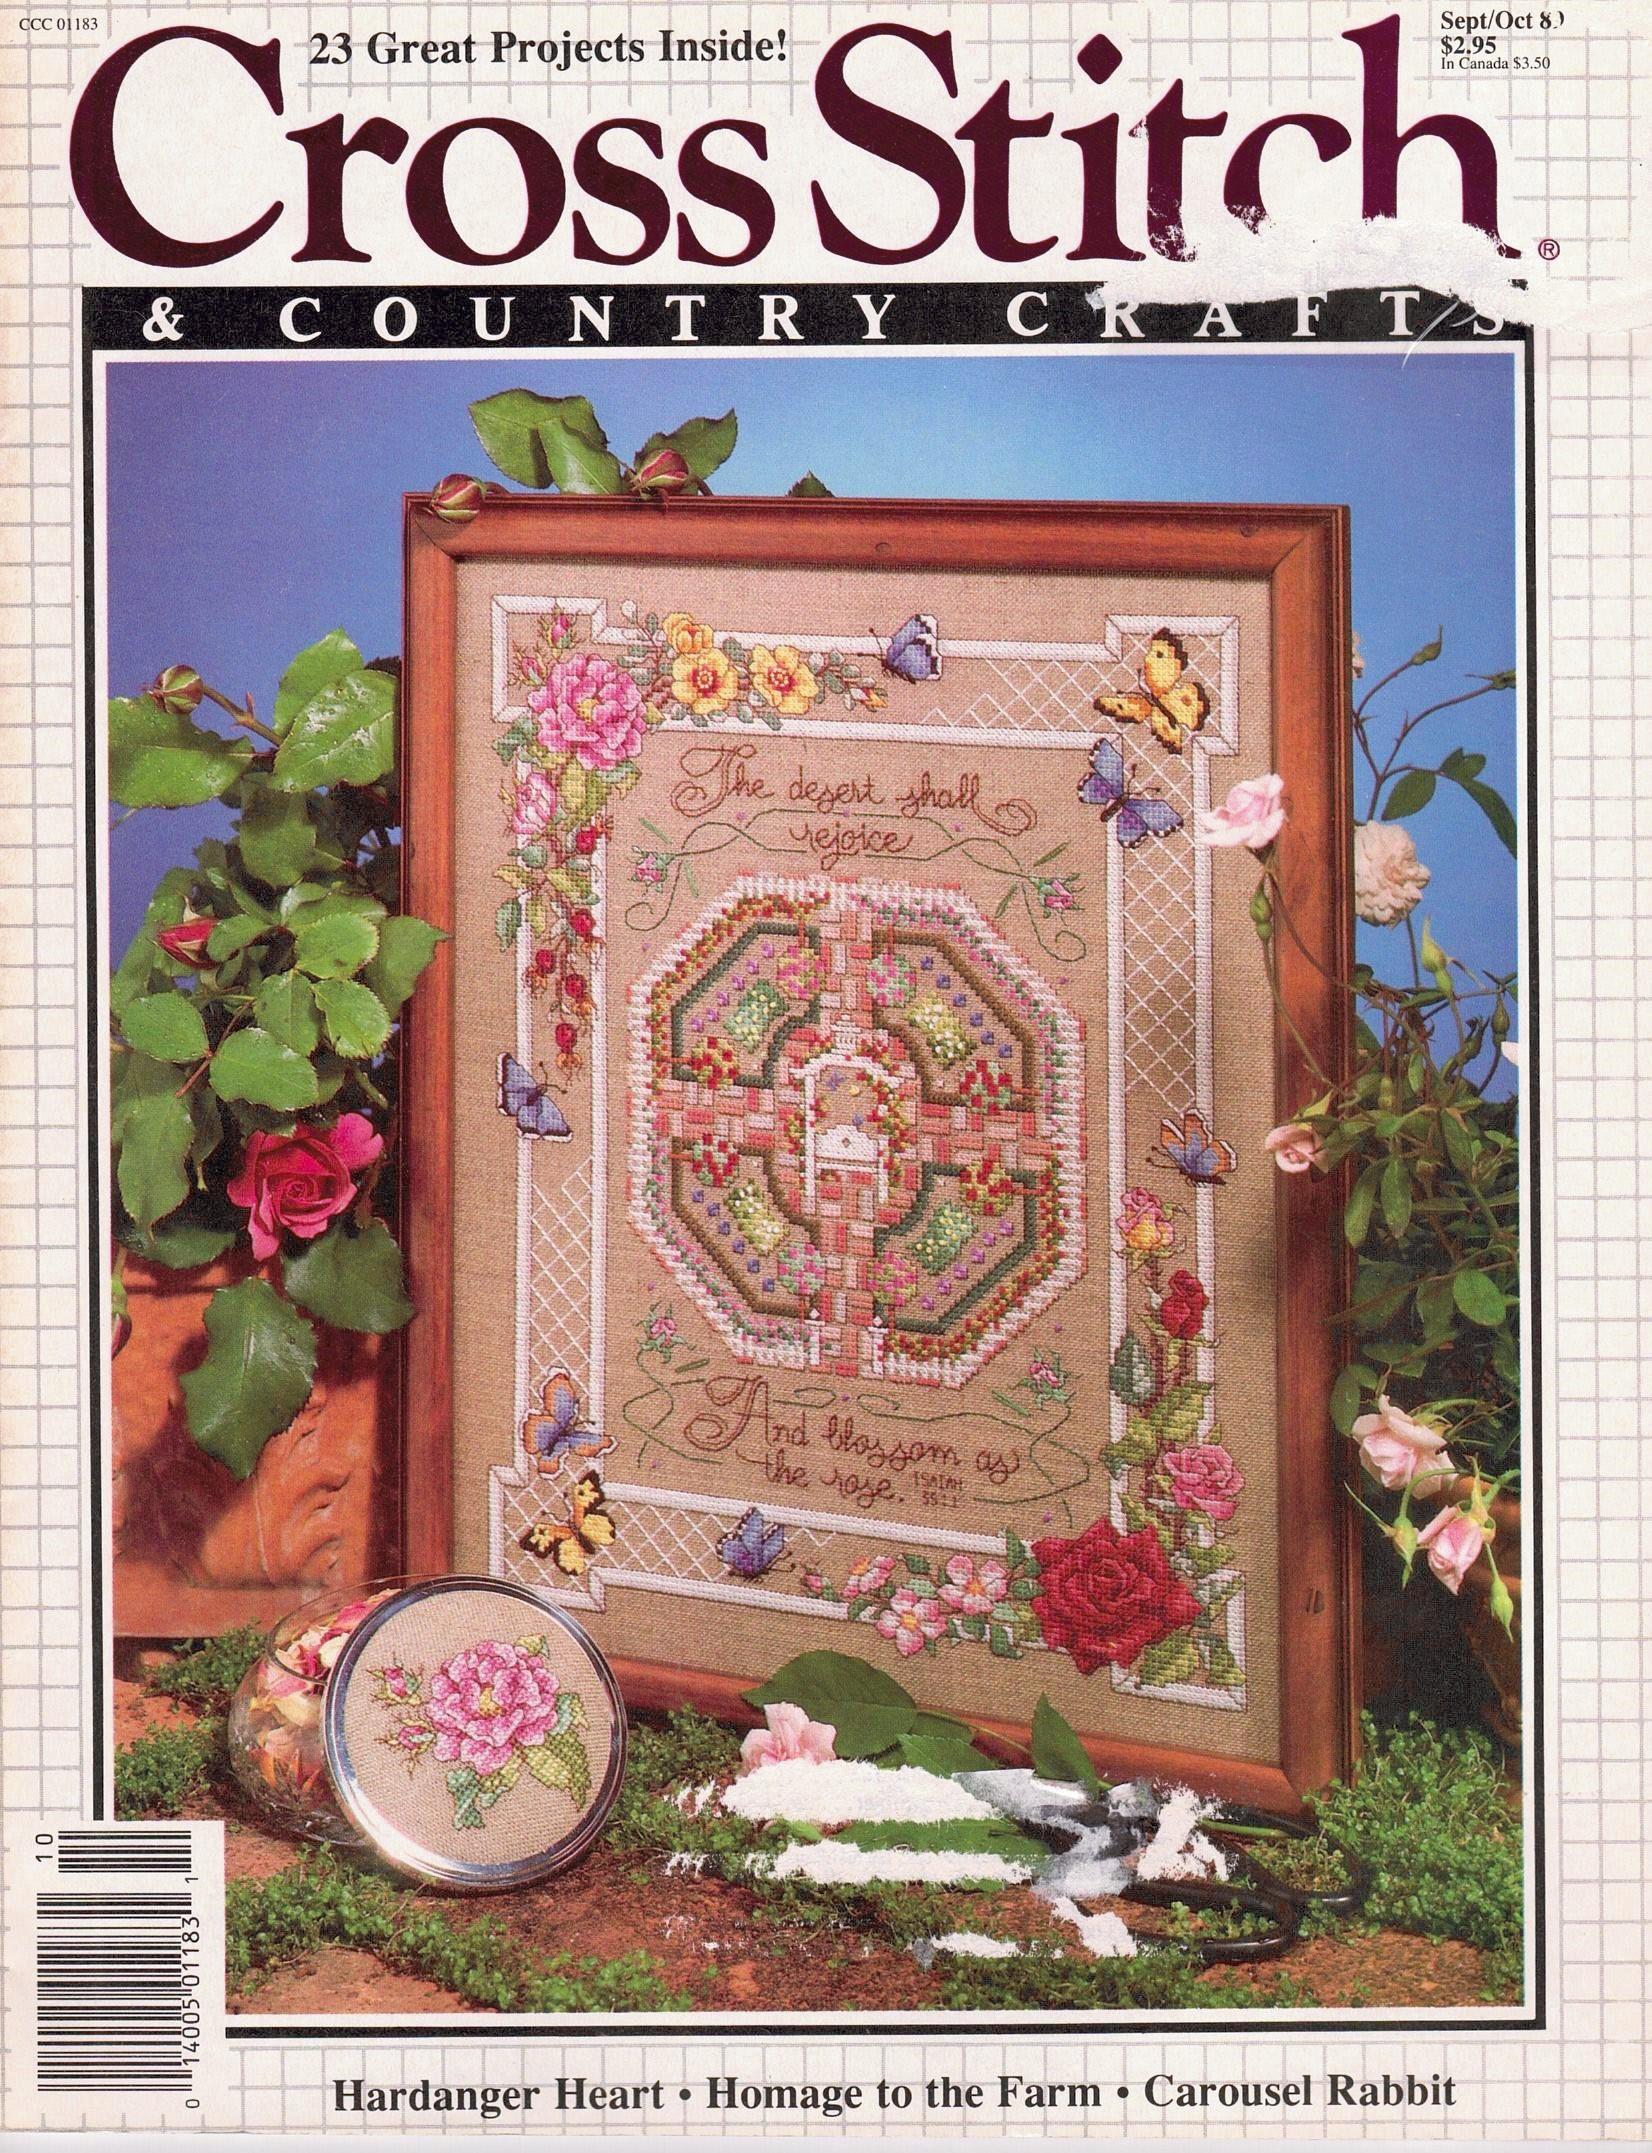 Cross Stitch And Country Crafts Cross Stitch Pattern Magazine SeptemberOctober 1987